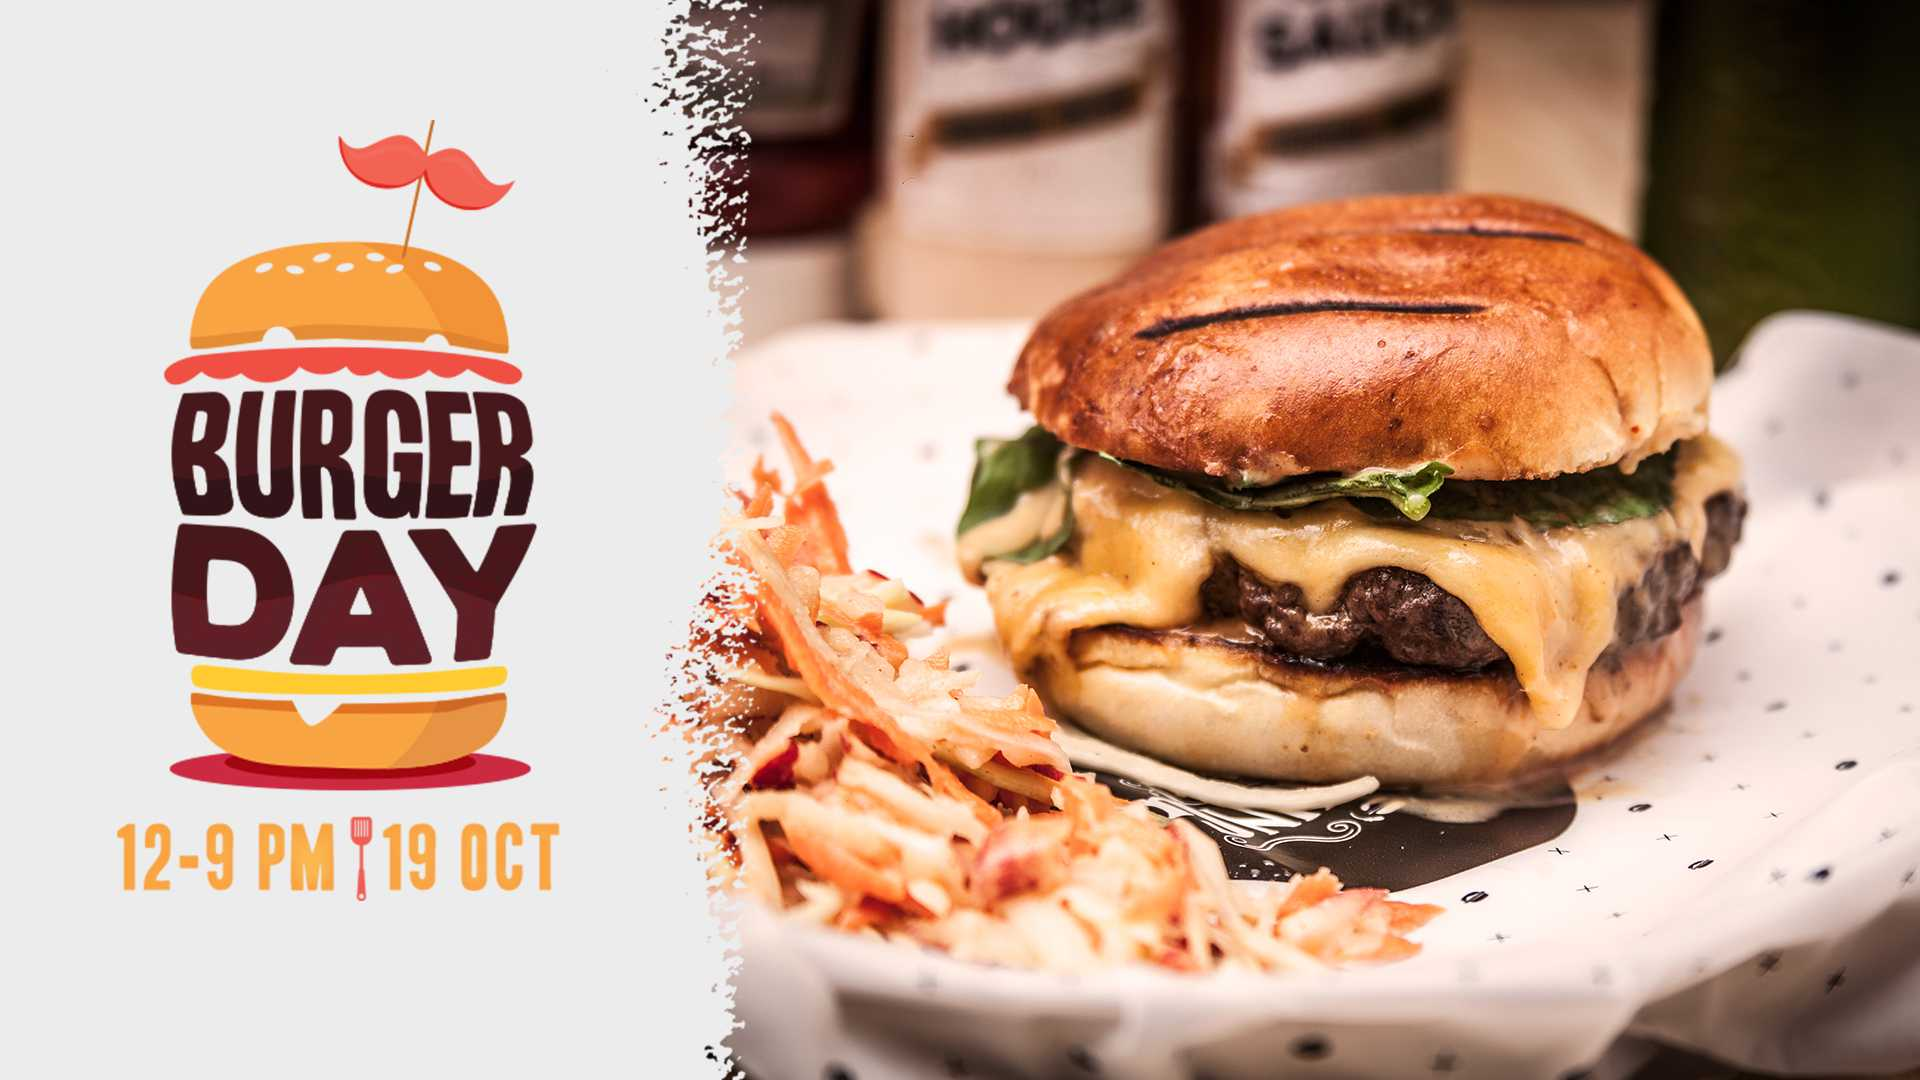 BurgerDay